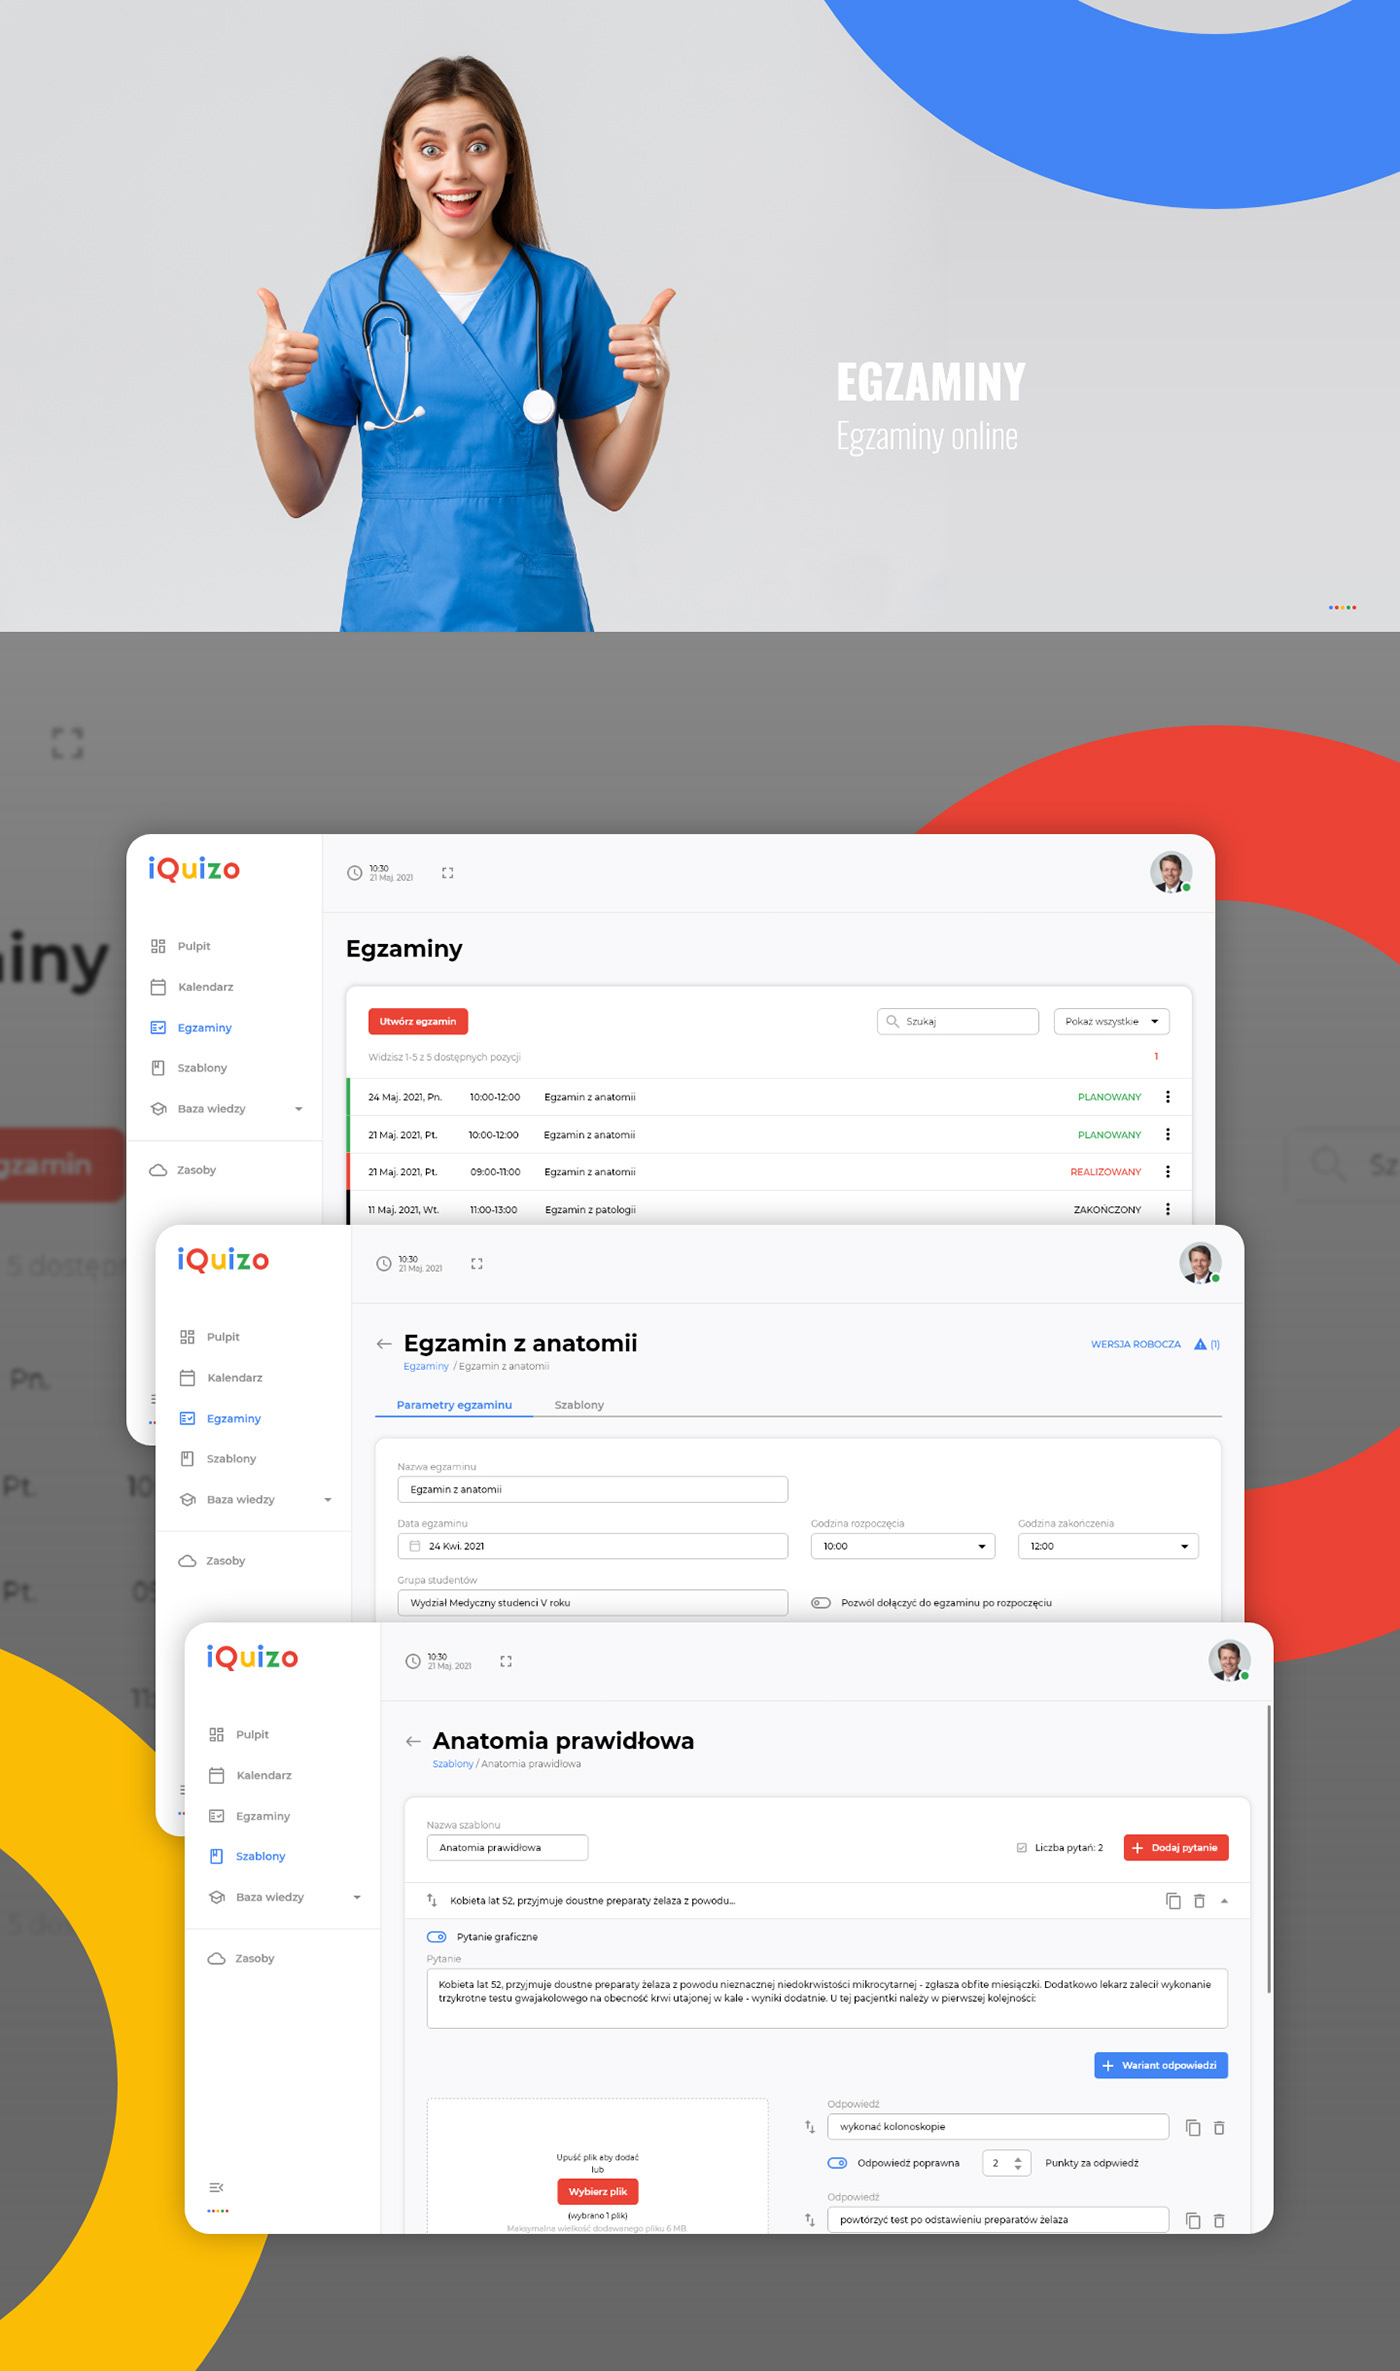 Adobe XD interaction medical ui design UI/UX user experience user interface UX design Website